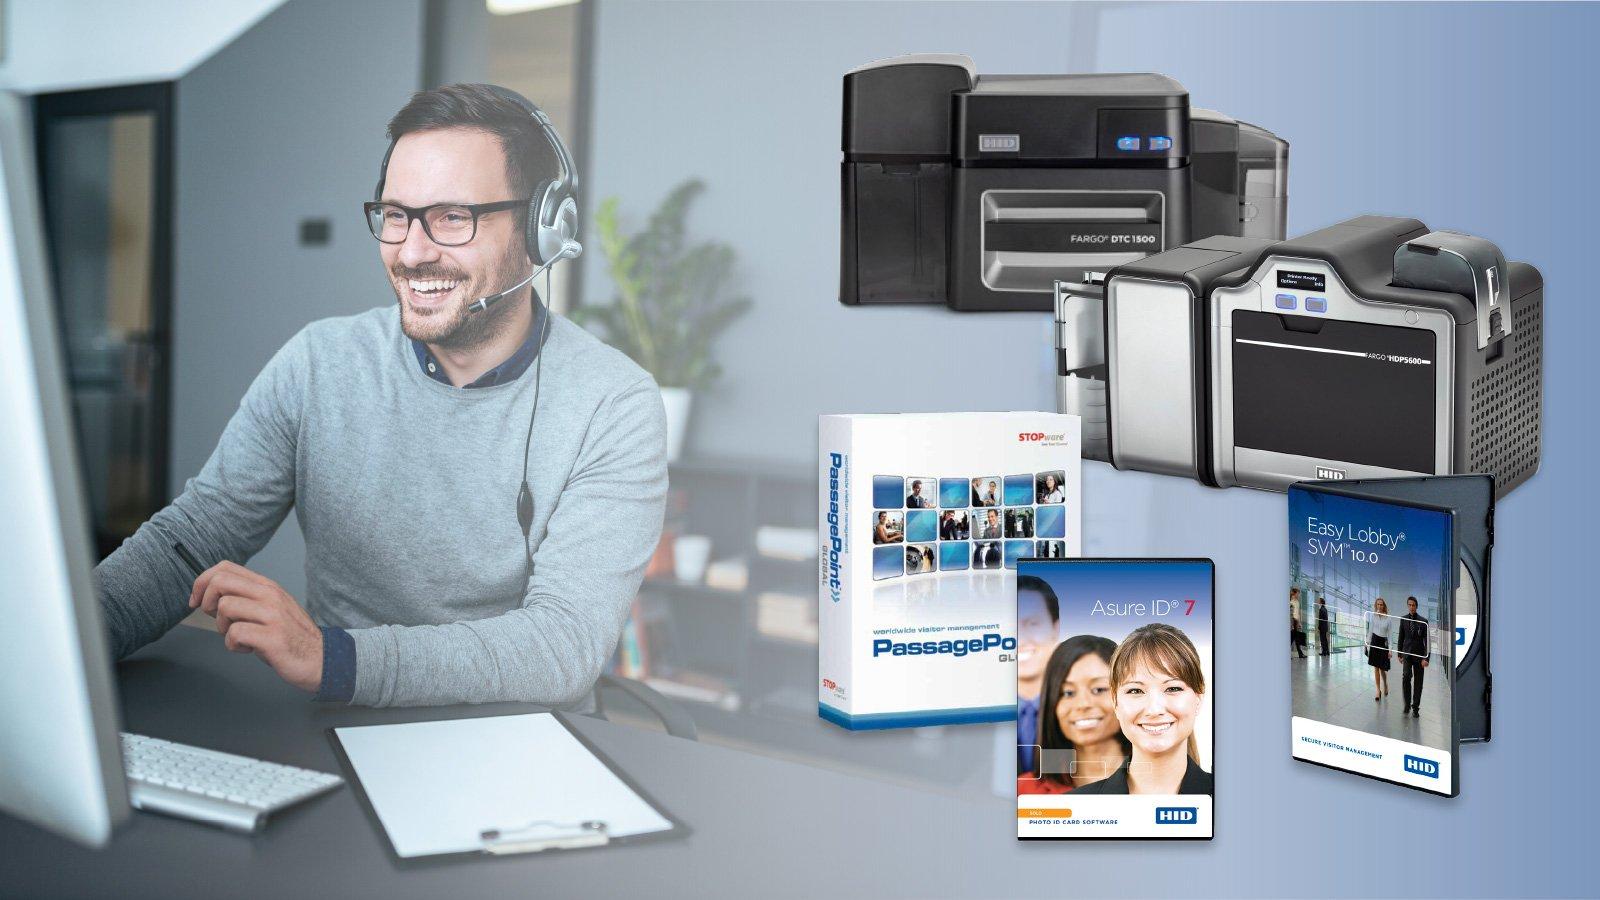 FARGO id card printer choose j. o'brien Phone Support